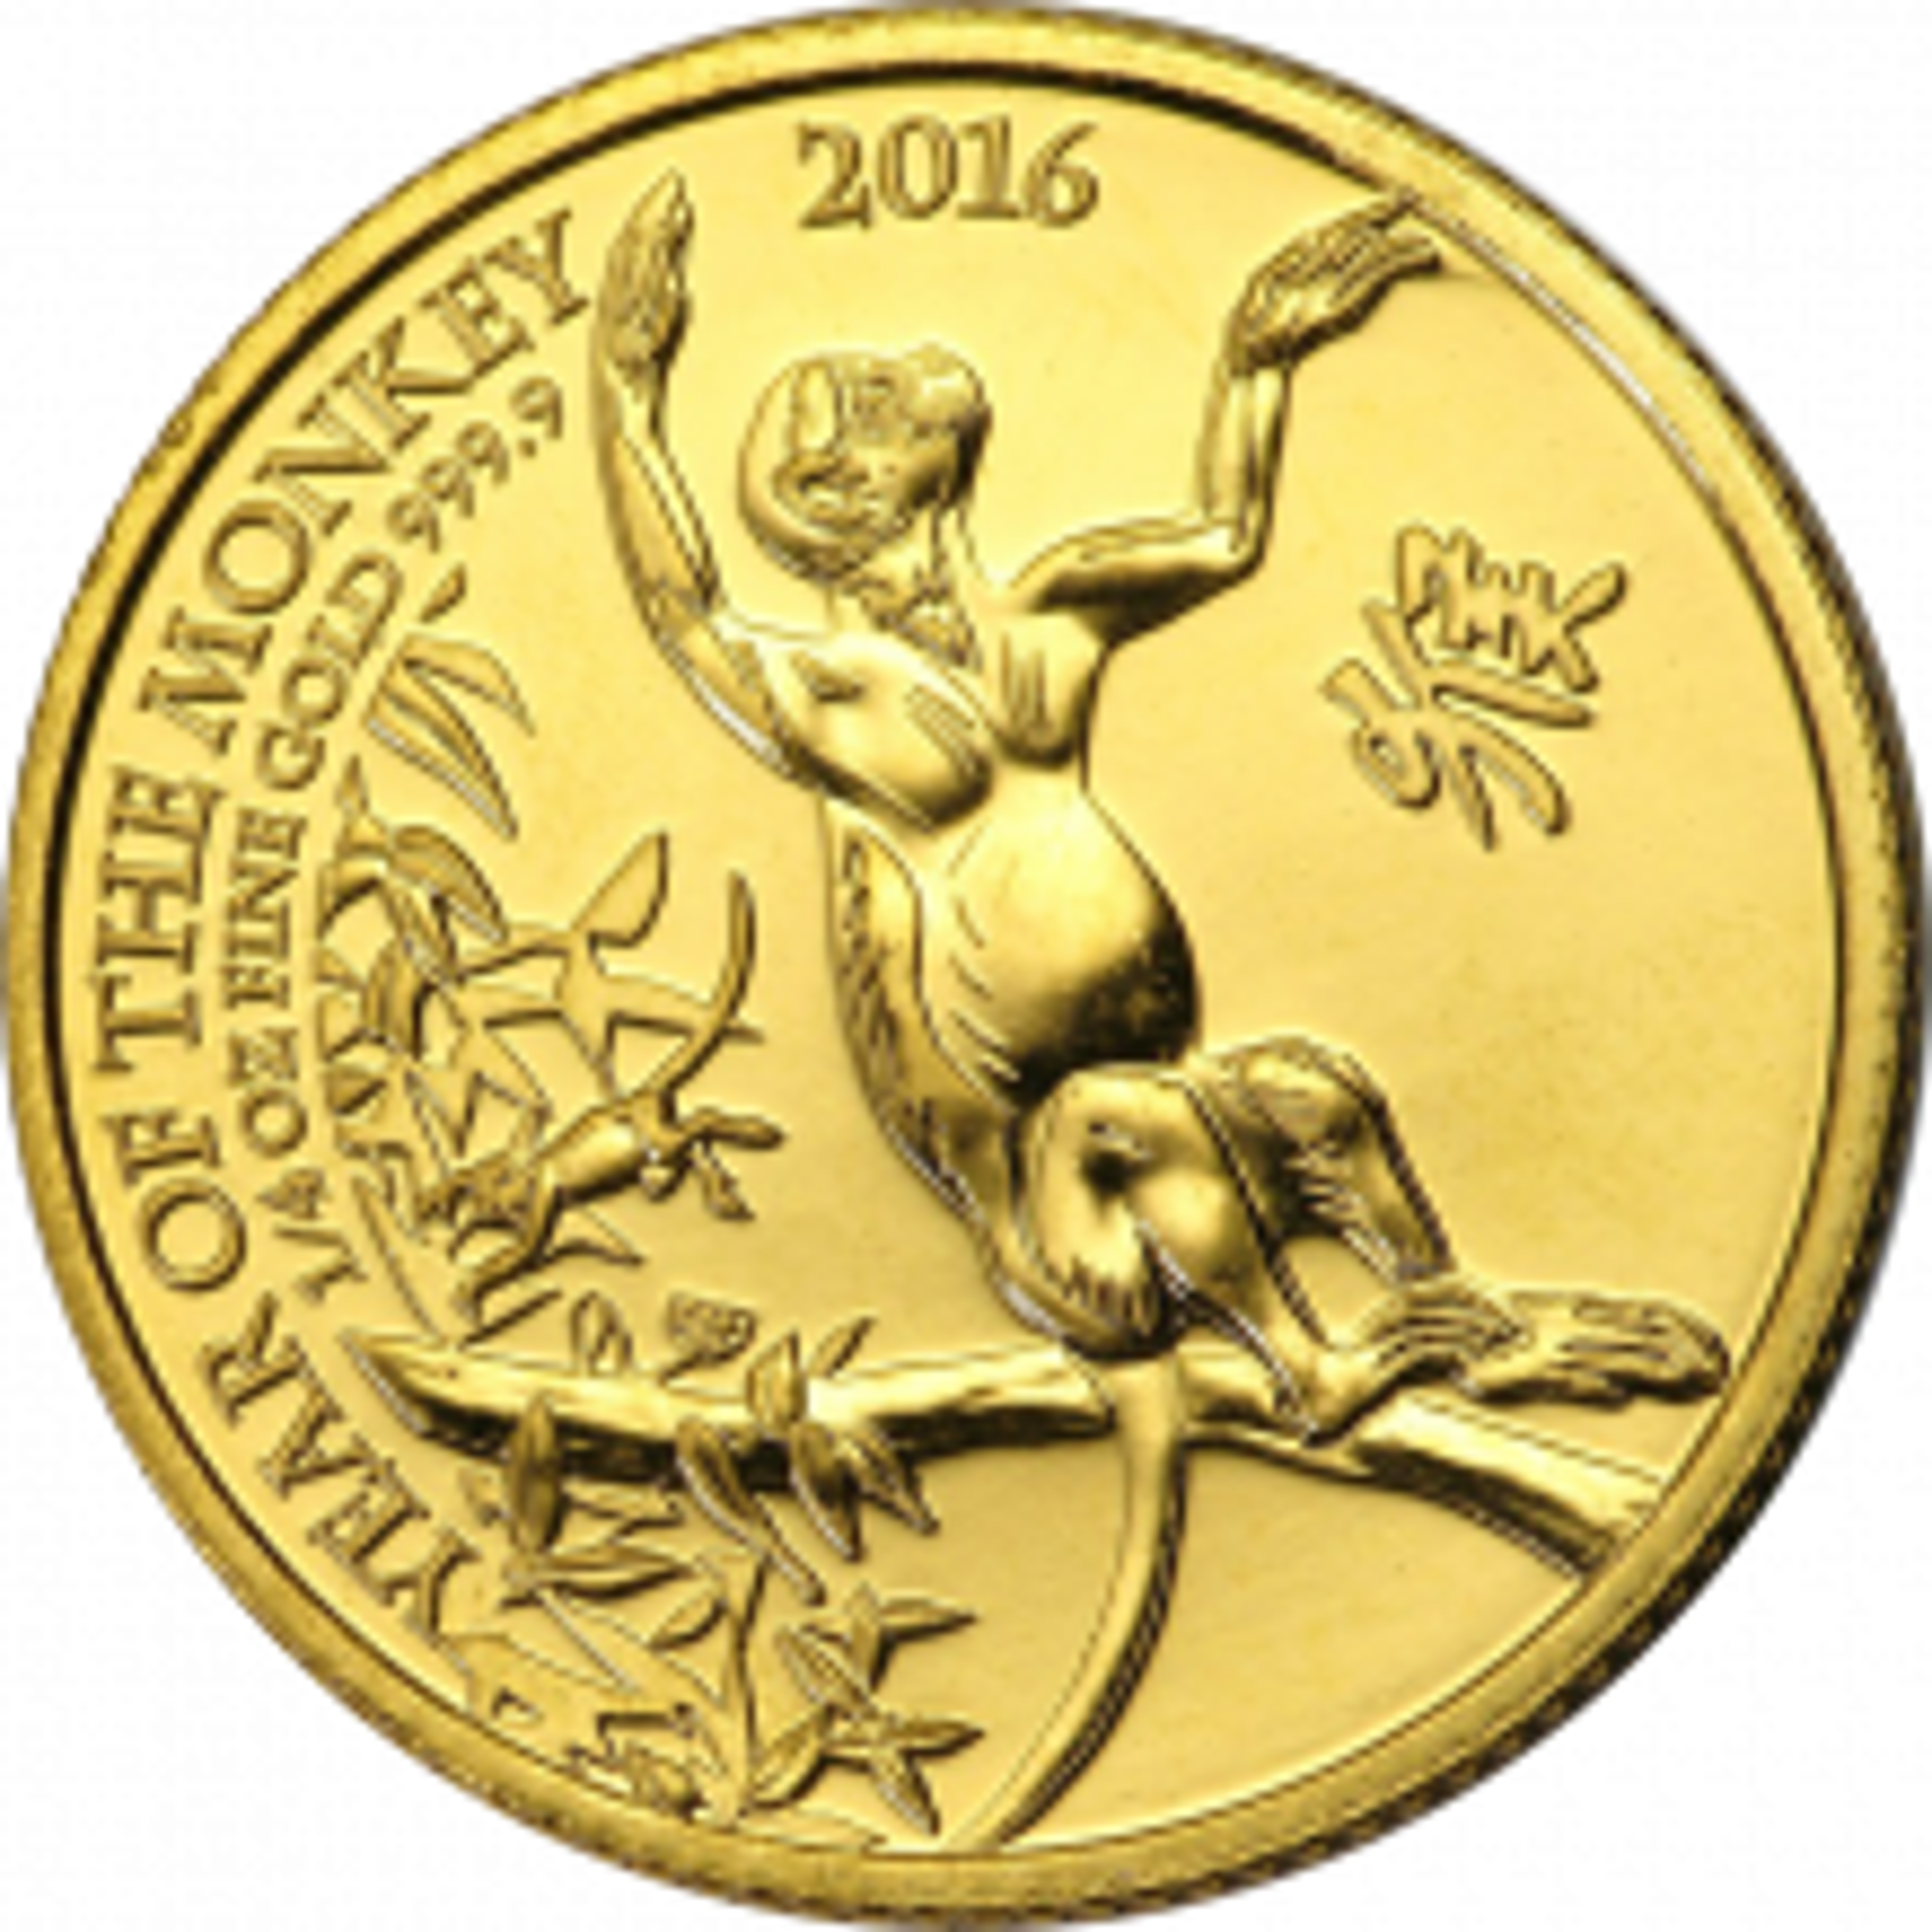 1 Troy ounce gouden munt UK Lunar 2016